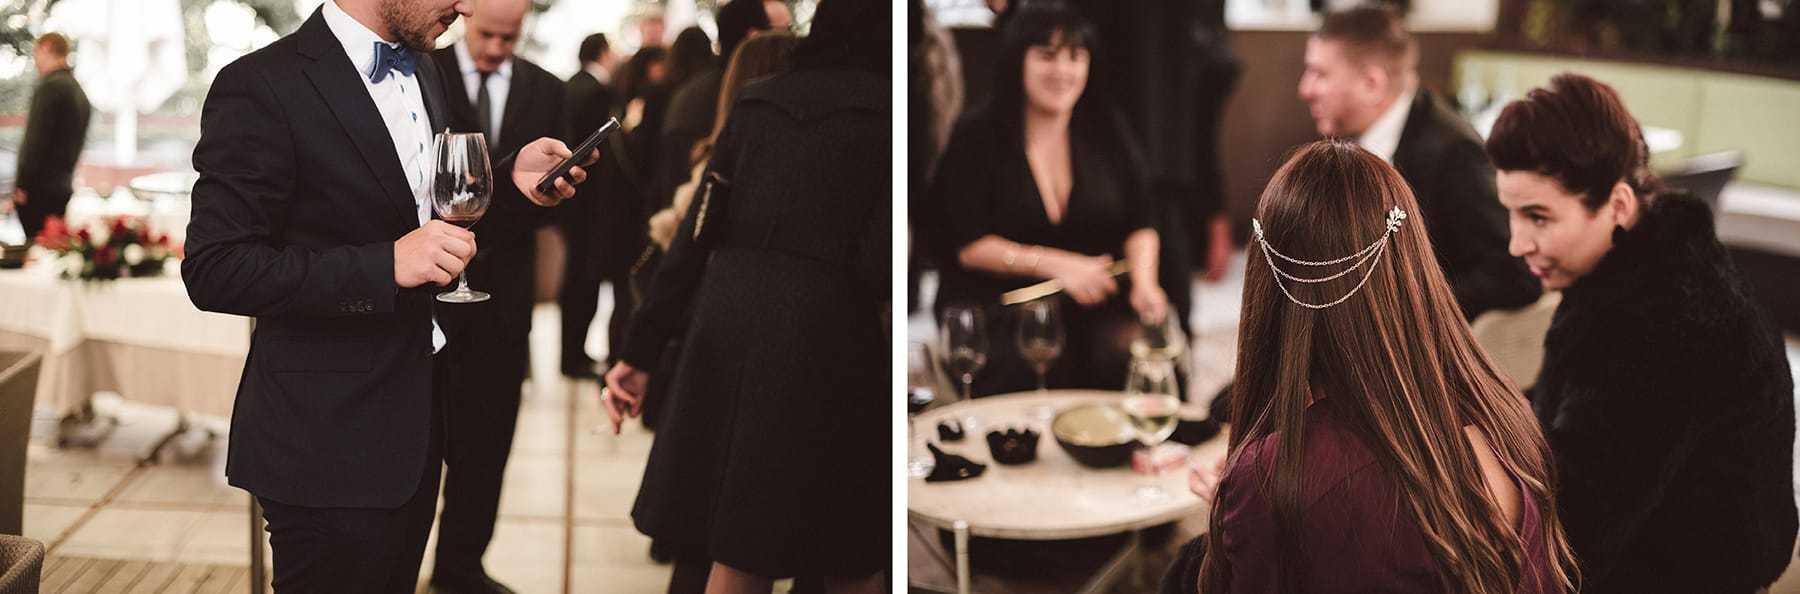 vestido_de_novia_otaduy_hilario_sanchez_fotografo_boda_barcelona_107